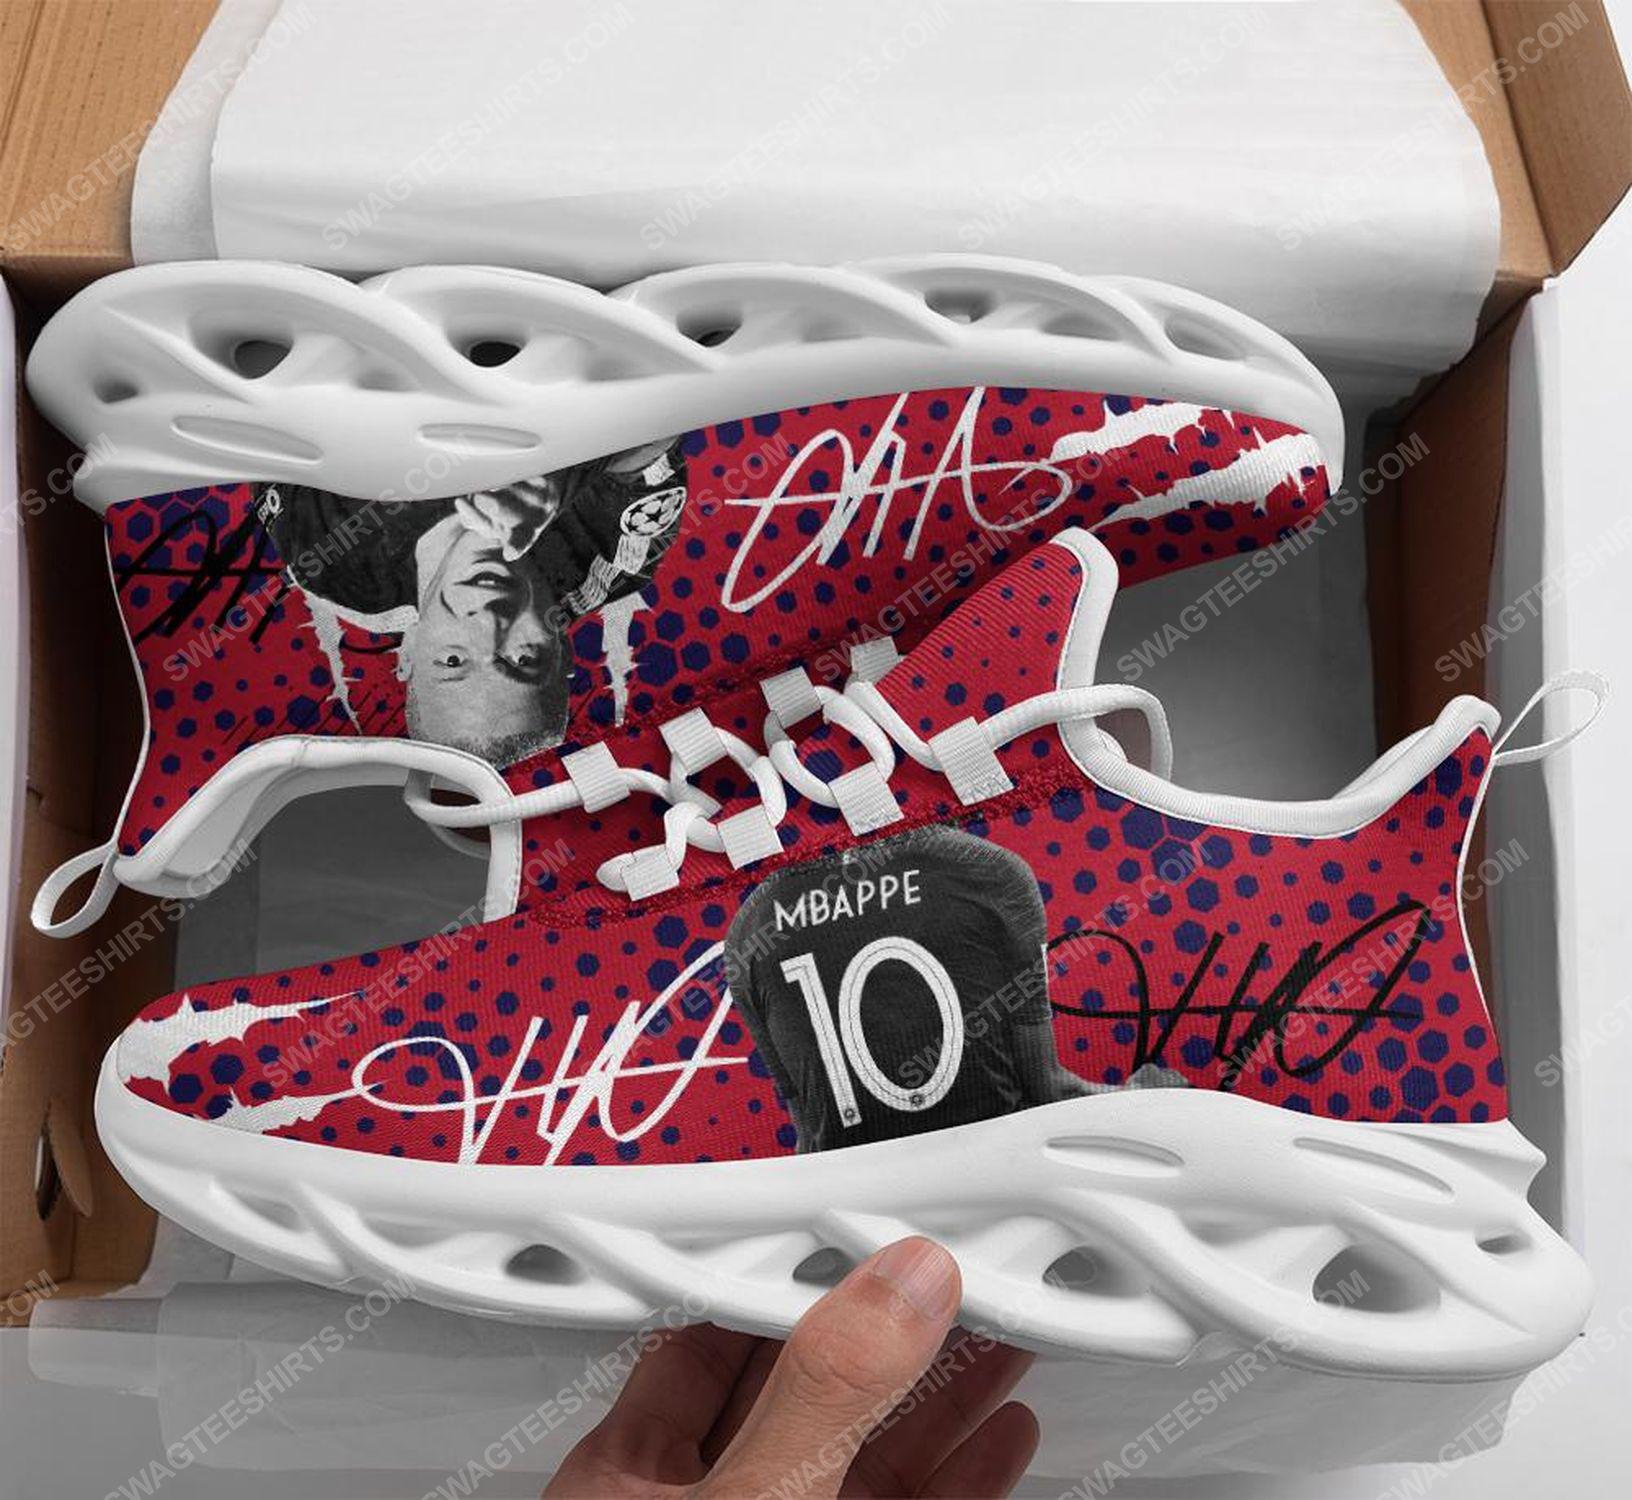 Kylian mbappe lottin paris saint-germain football club max soul shoes 1 - Copy (2)